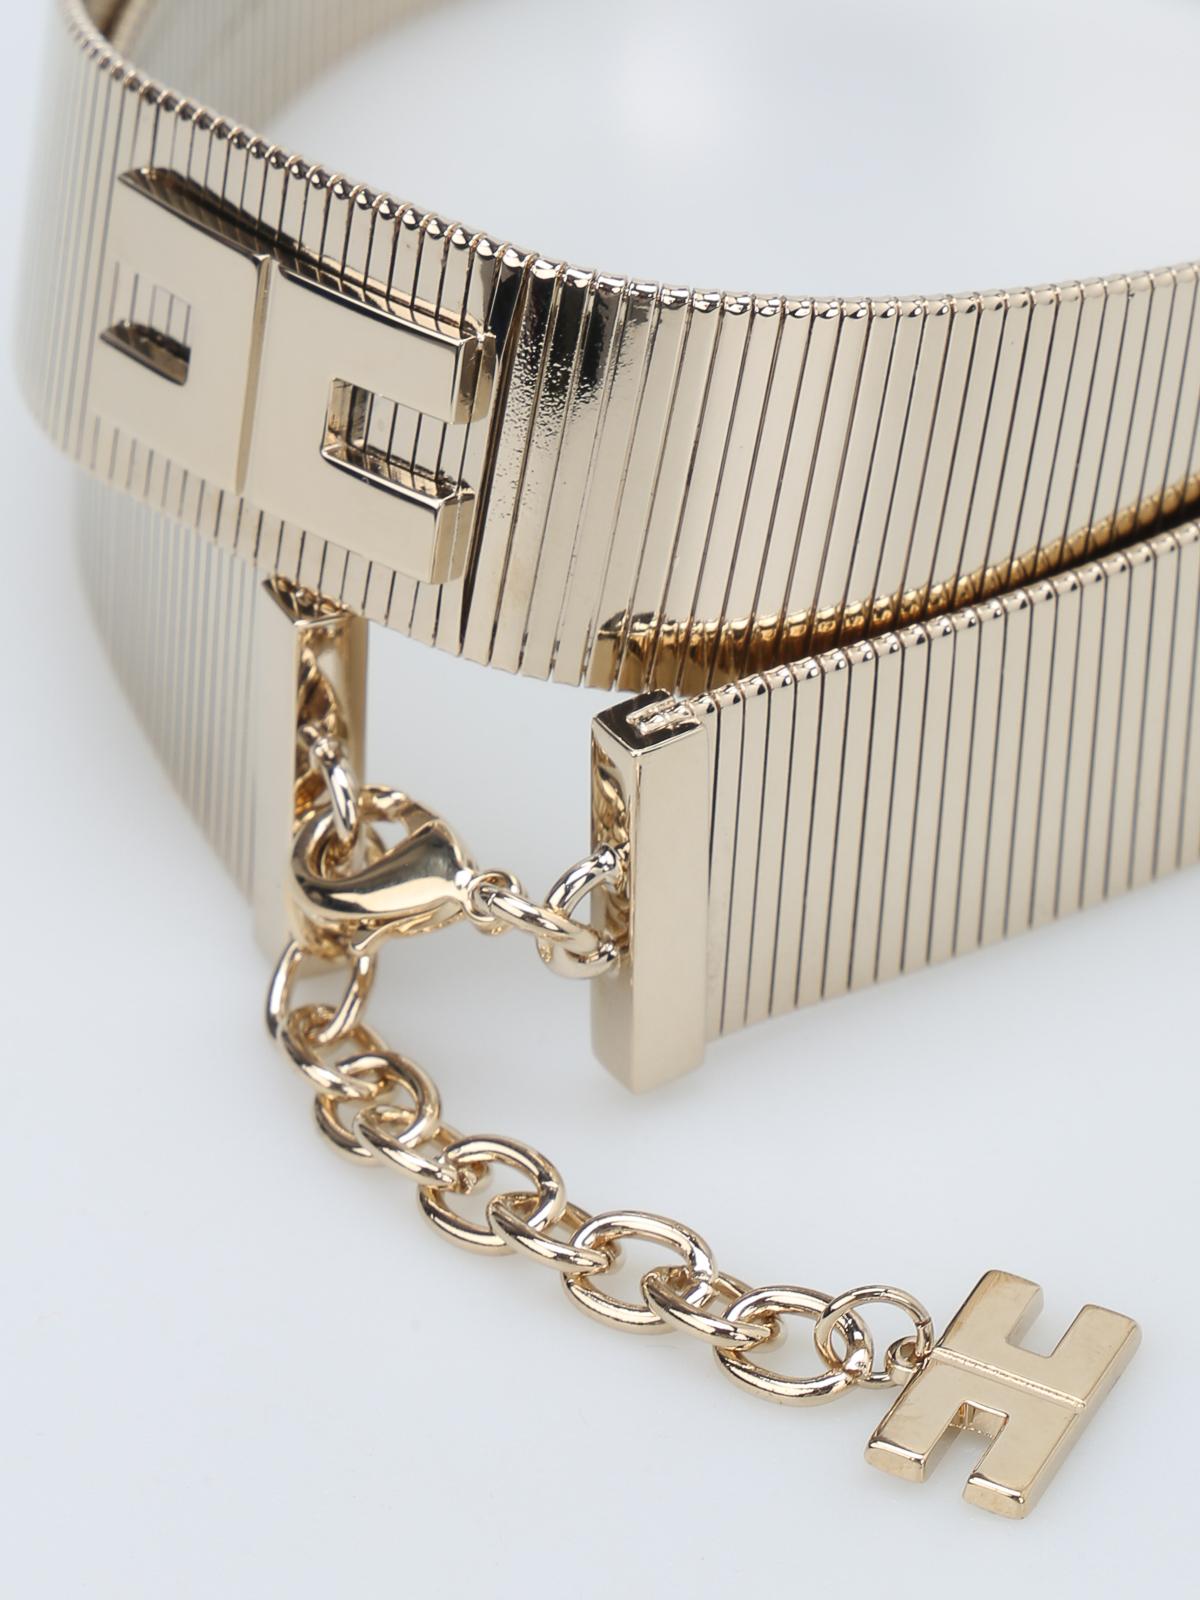 nuovo massimo sconto più votato scarpe da corsa Elisabetta Franchi - Metal waist belt - belts - CT7699184 ...